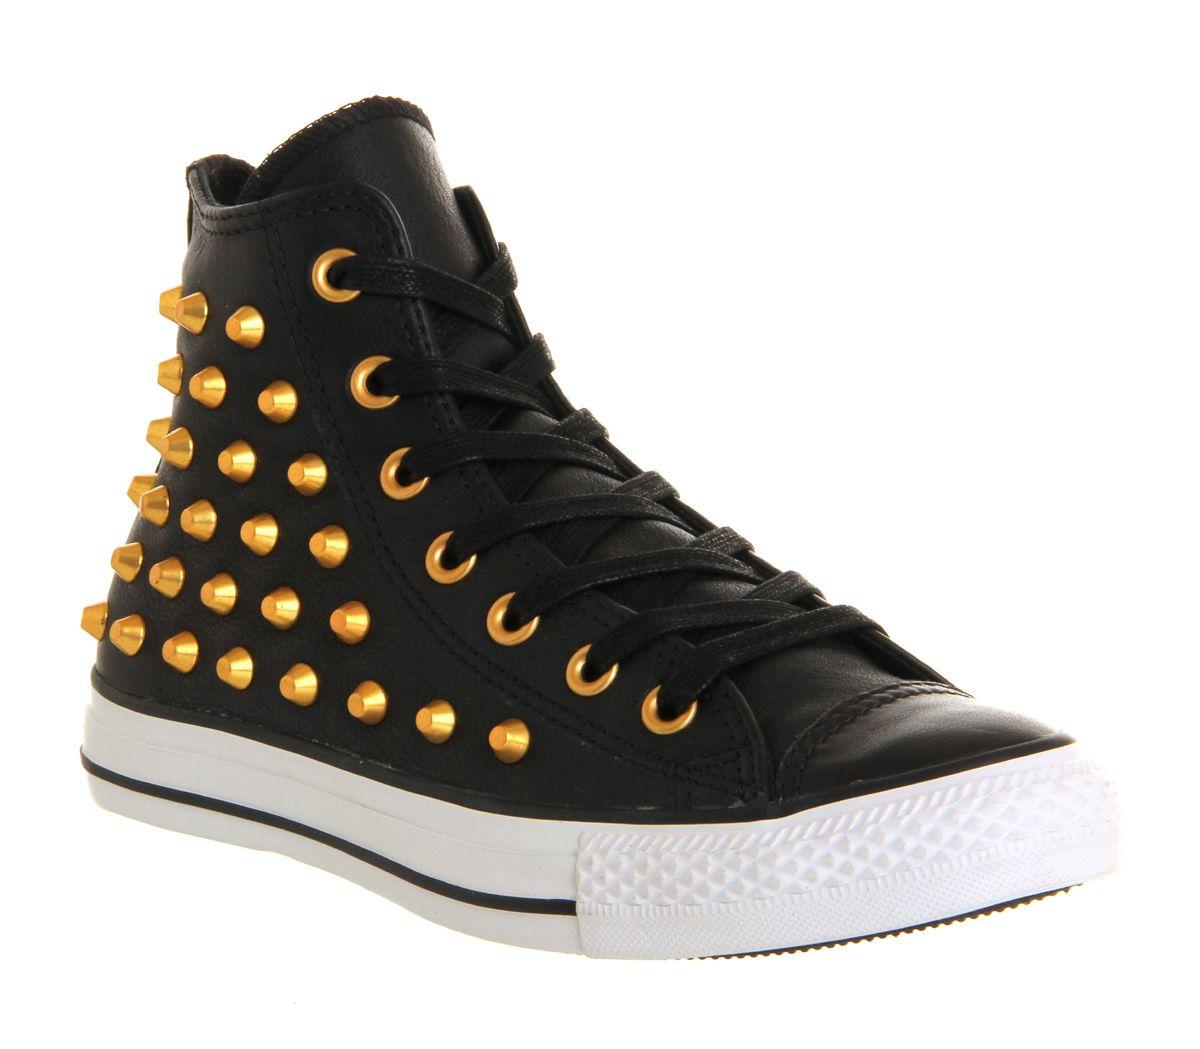 Converse All Star Hi Lthr Unisex Sports Black Gold Studs